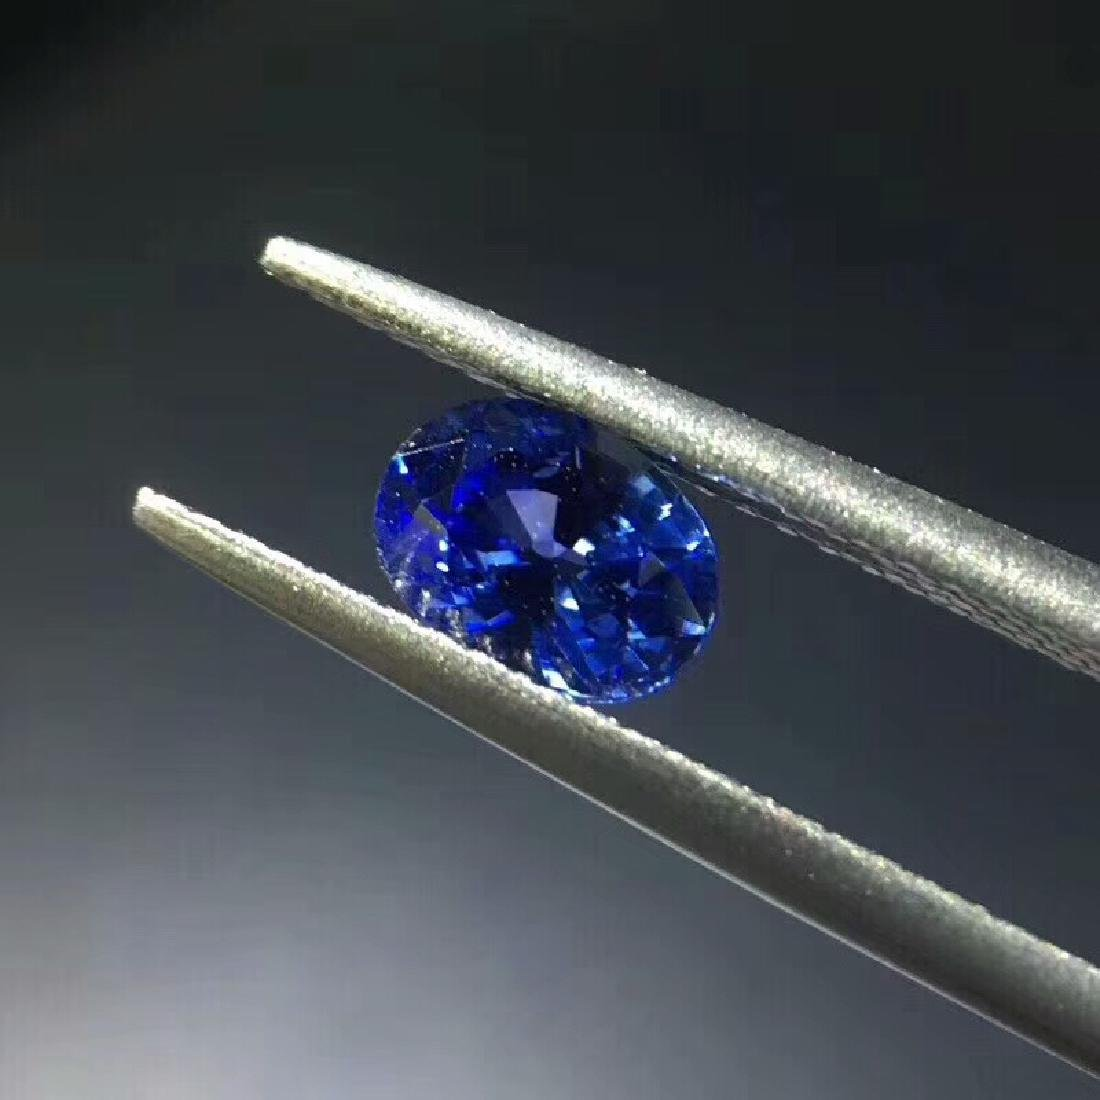 1.02 ct Sapphire 4.8*6.5*3.7 mm Oval Cut - 2